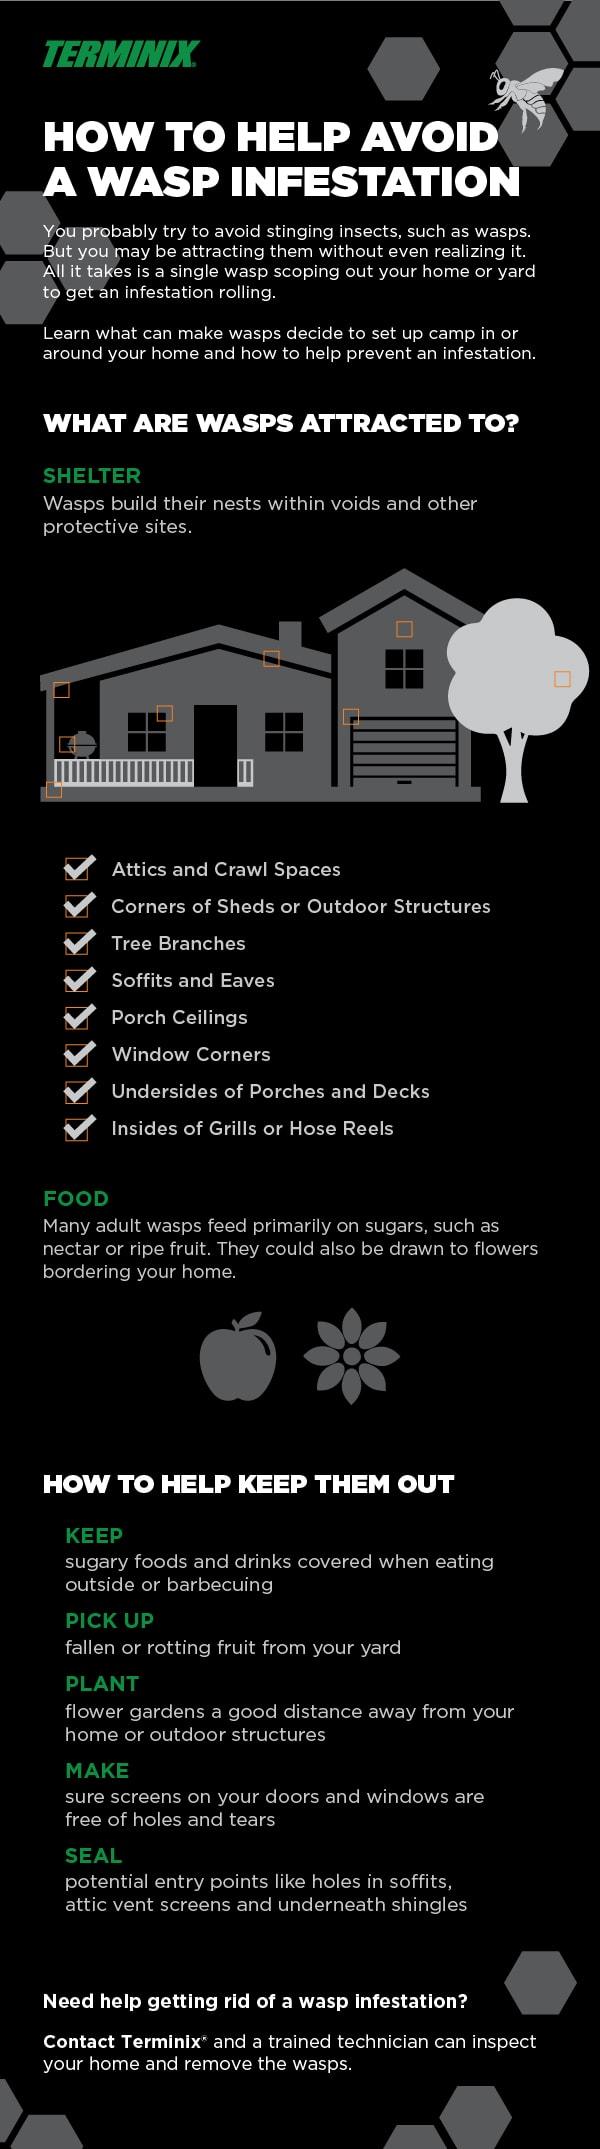 753294b07ee58cd936aeed3a7907a475 - How To Get Rid Of Wasp Nest In Roof Tiles